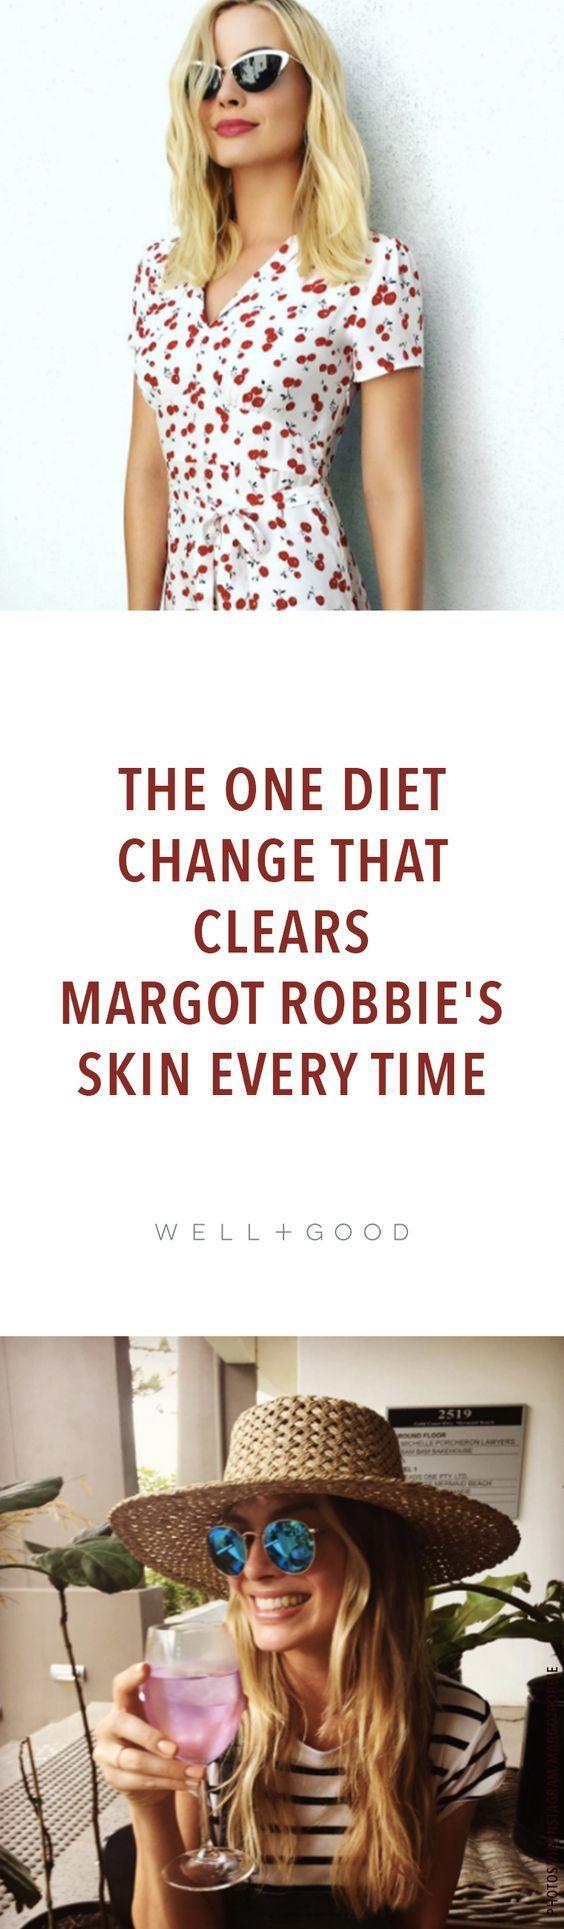 What Margot Robbie eats